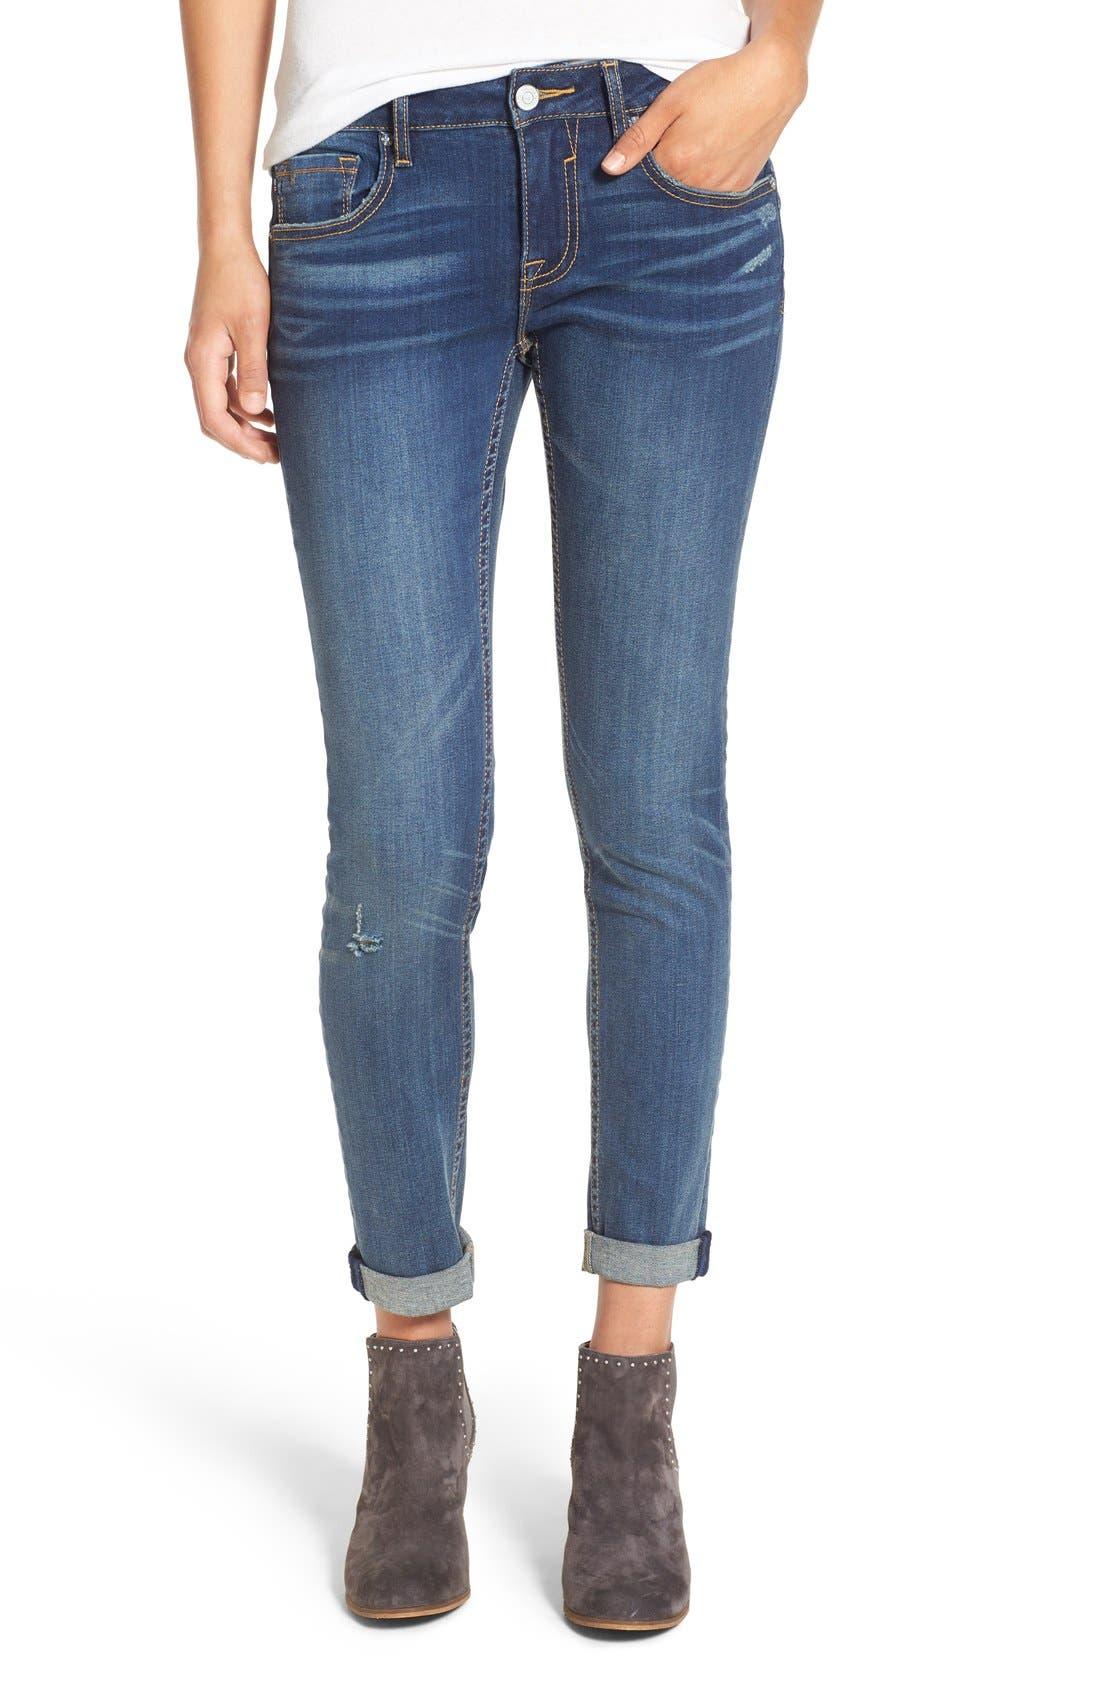 Alternate Image 1 Selected - Vigoss 'Thompson' Distressed Skinny Jeans (Neptune)